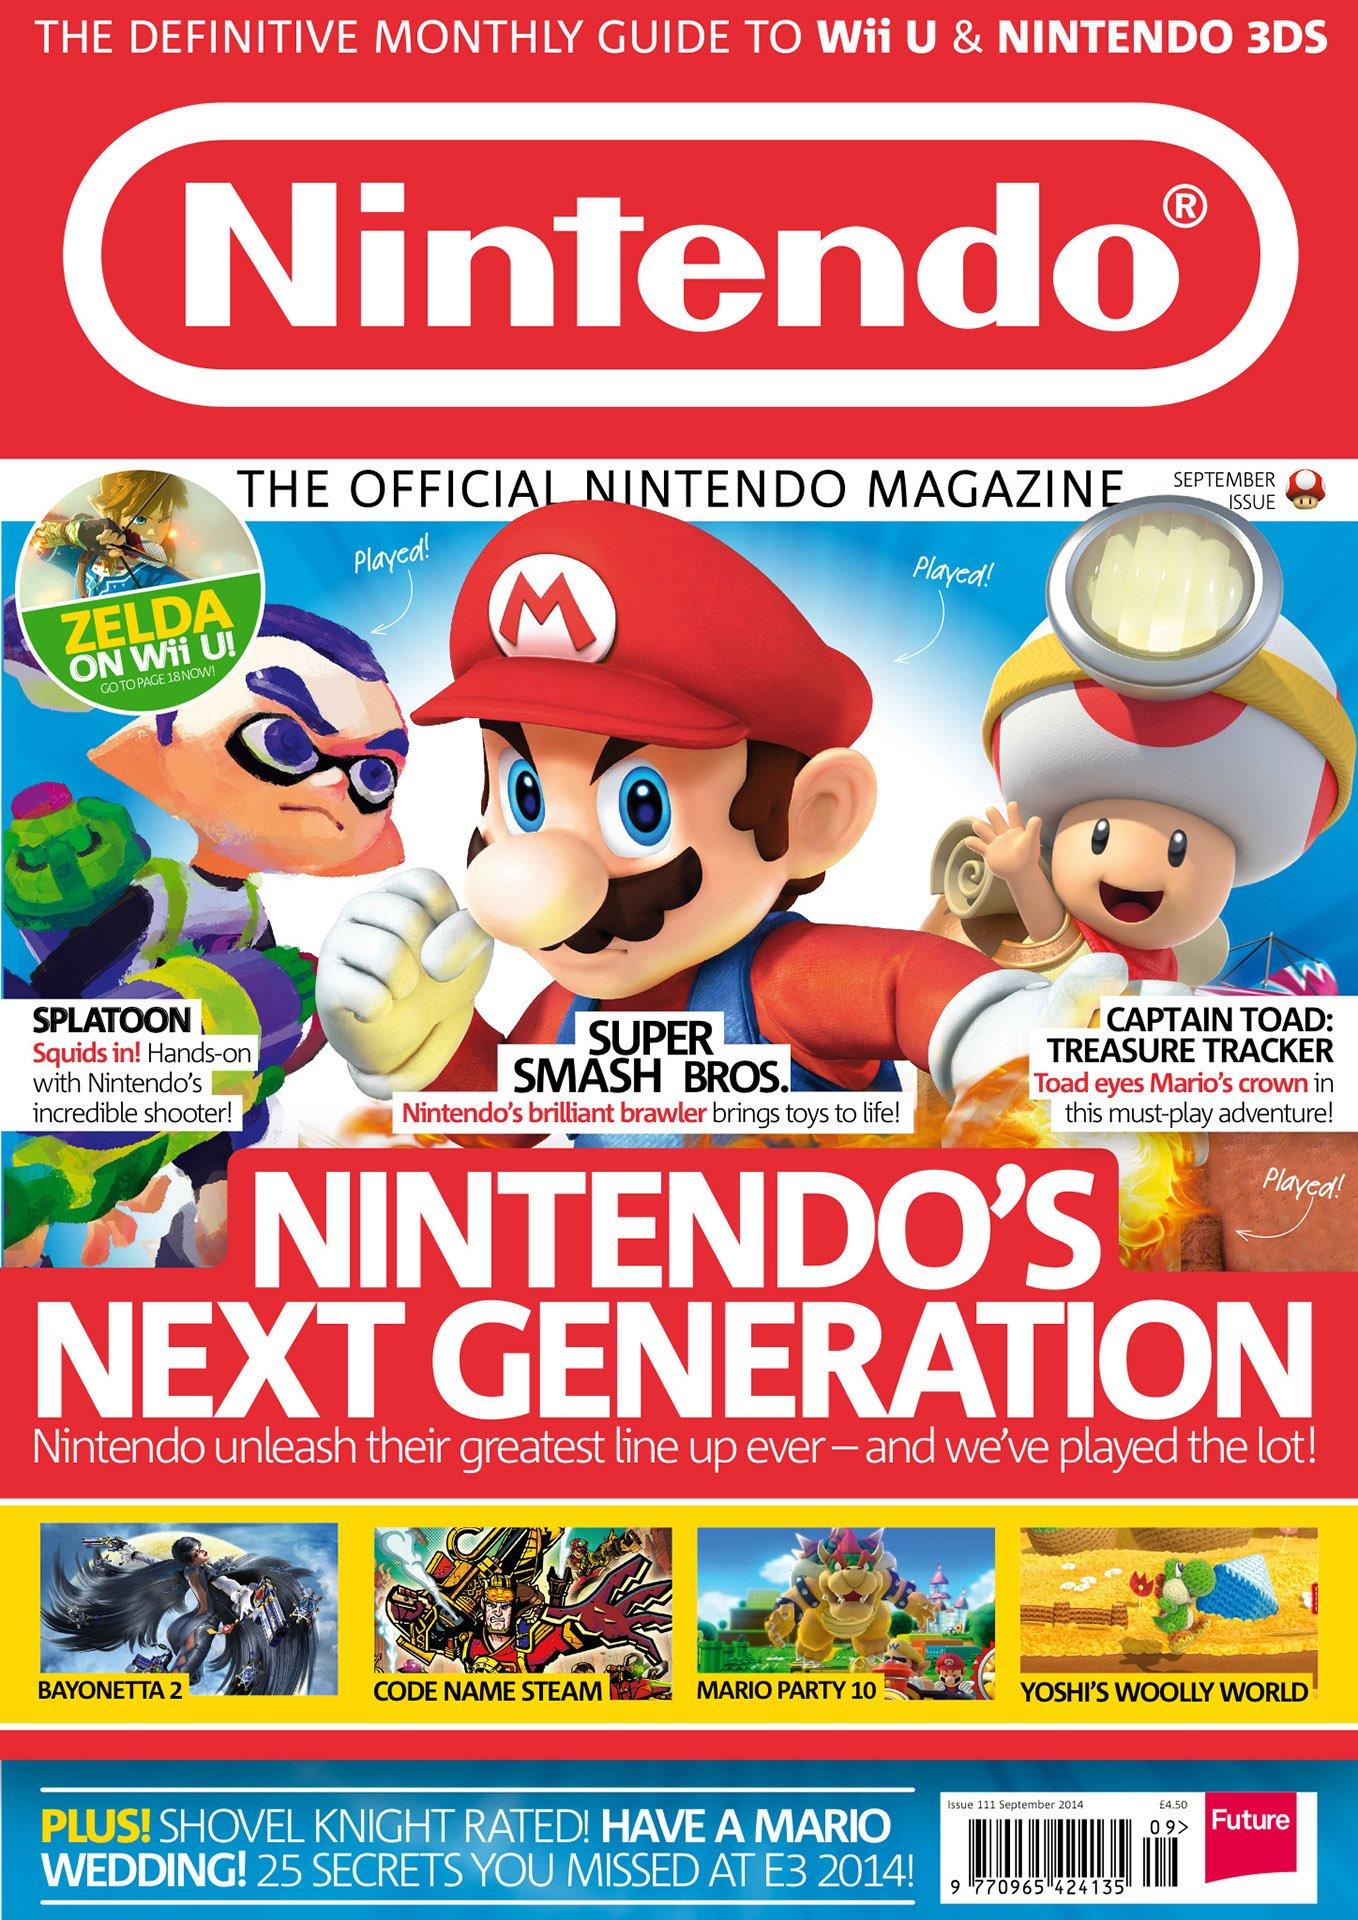 Official Nintendo Magazine 111 (September 2014)